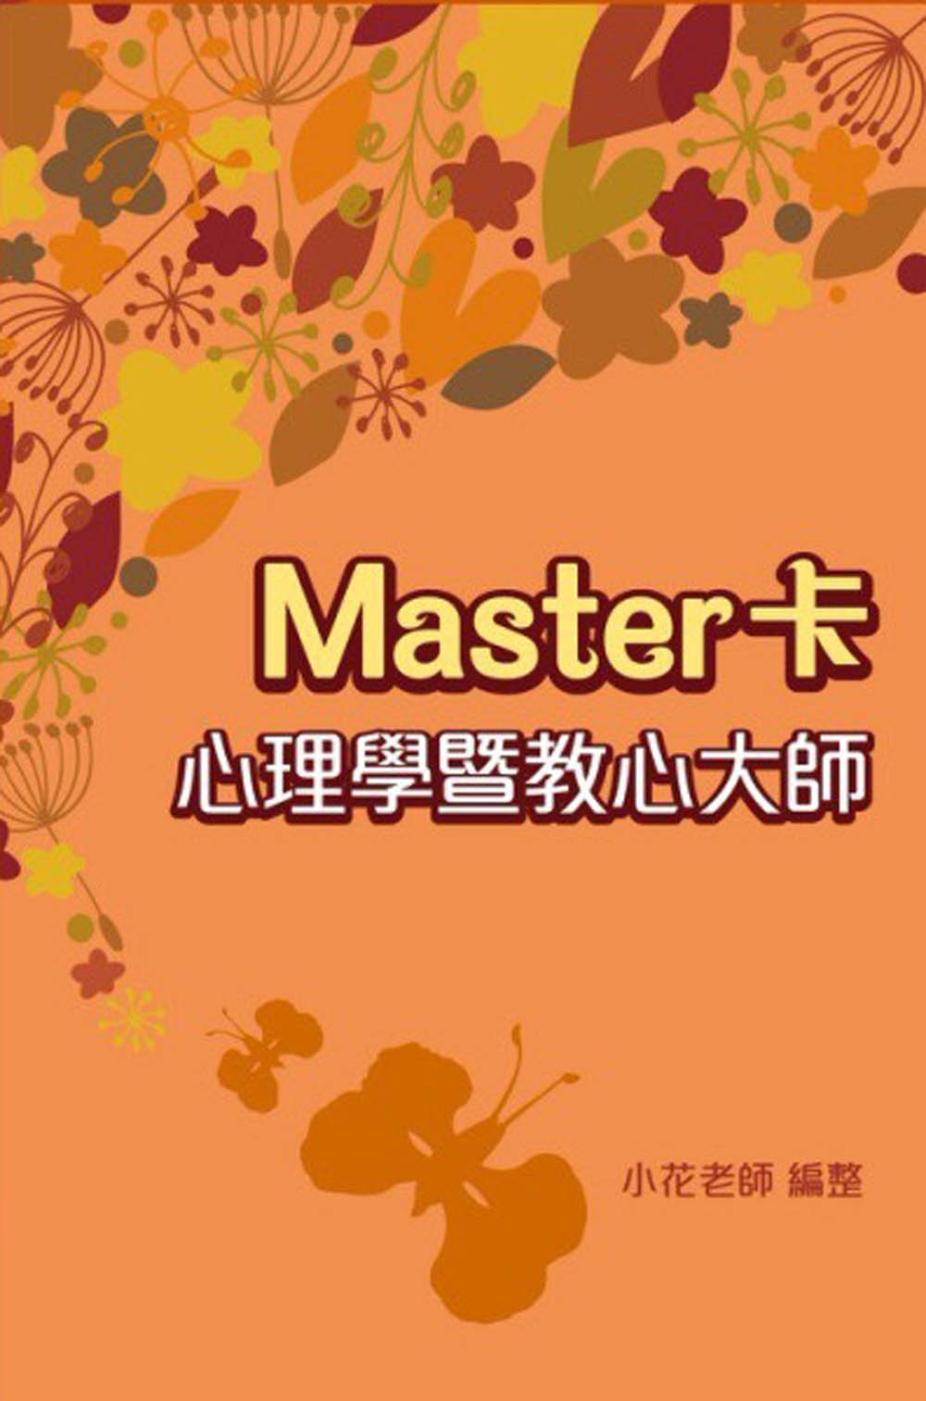 Master卡 心理學暨教心大師